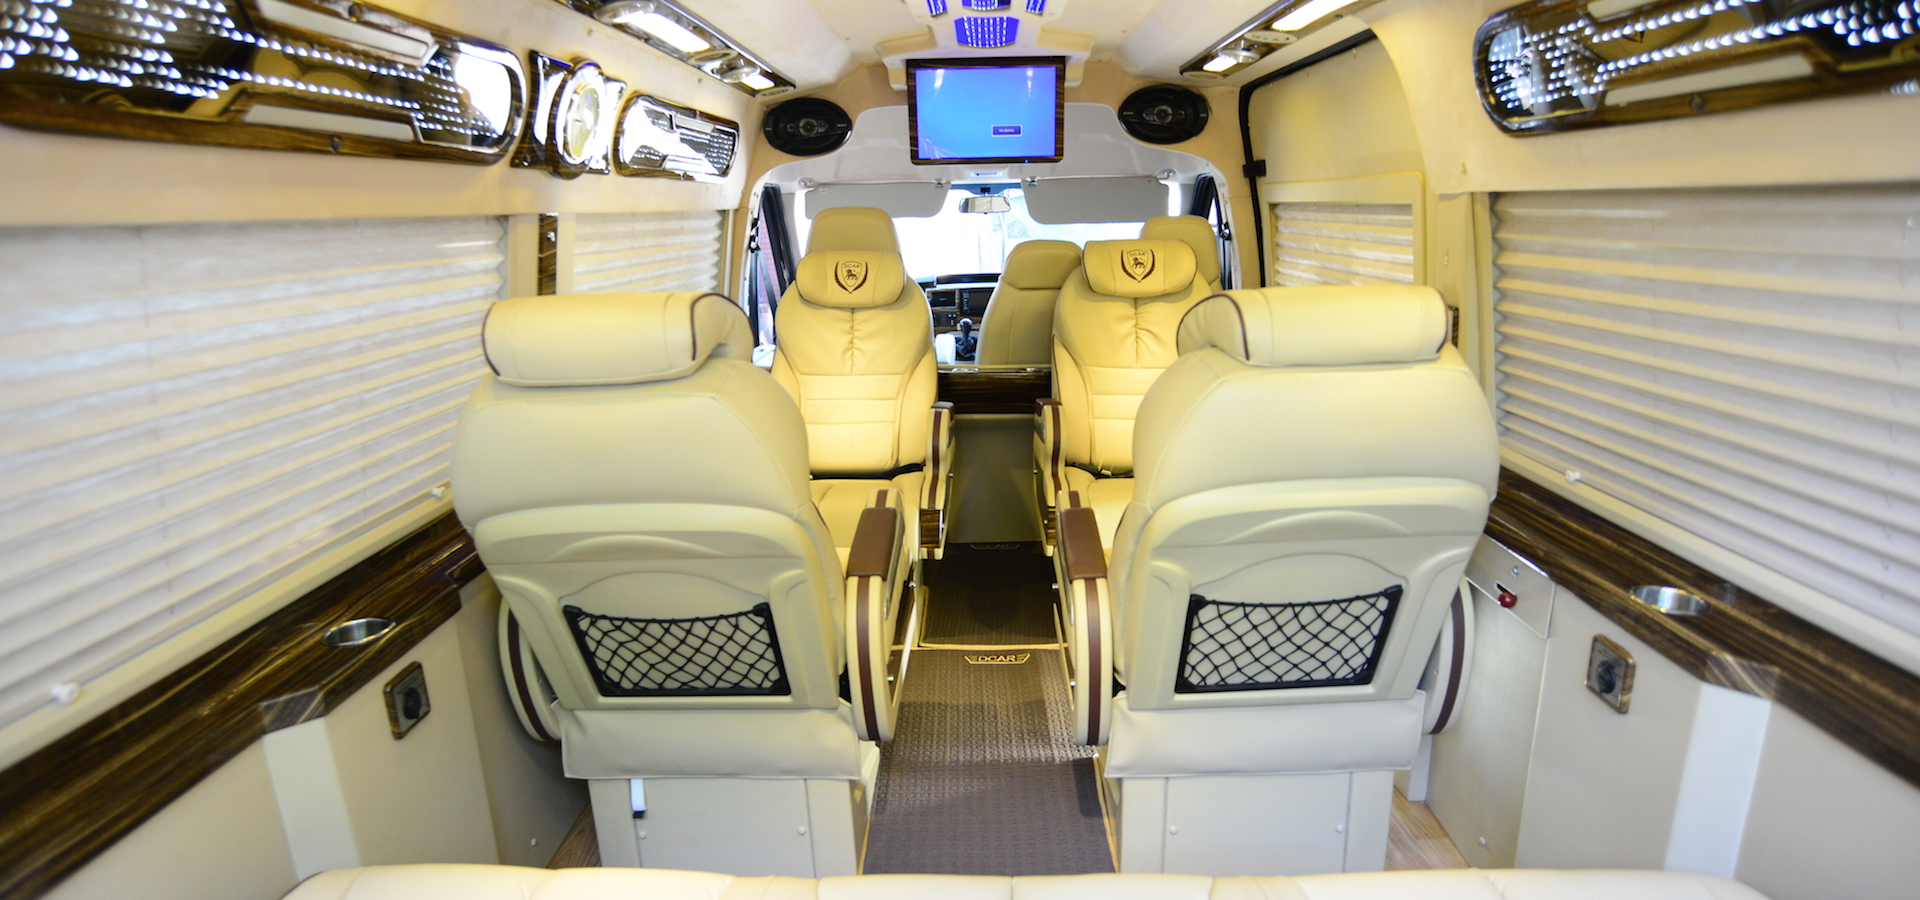 Ford Transit Dcar Limousine 2019 – 2020 (Bản 9 chỗ)5